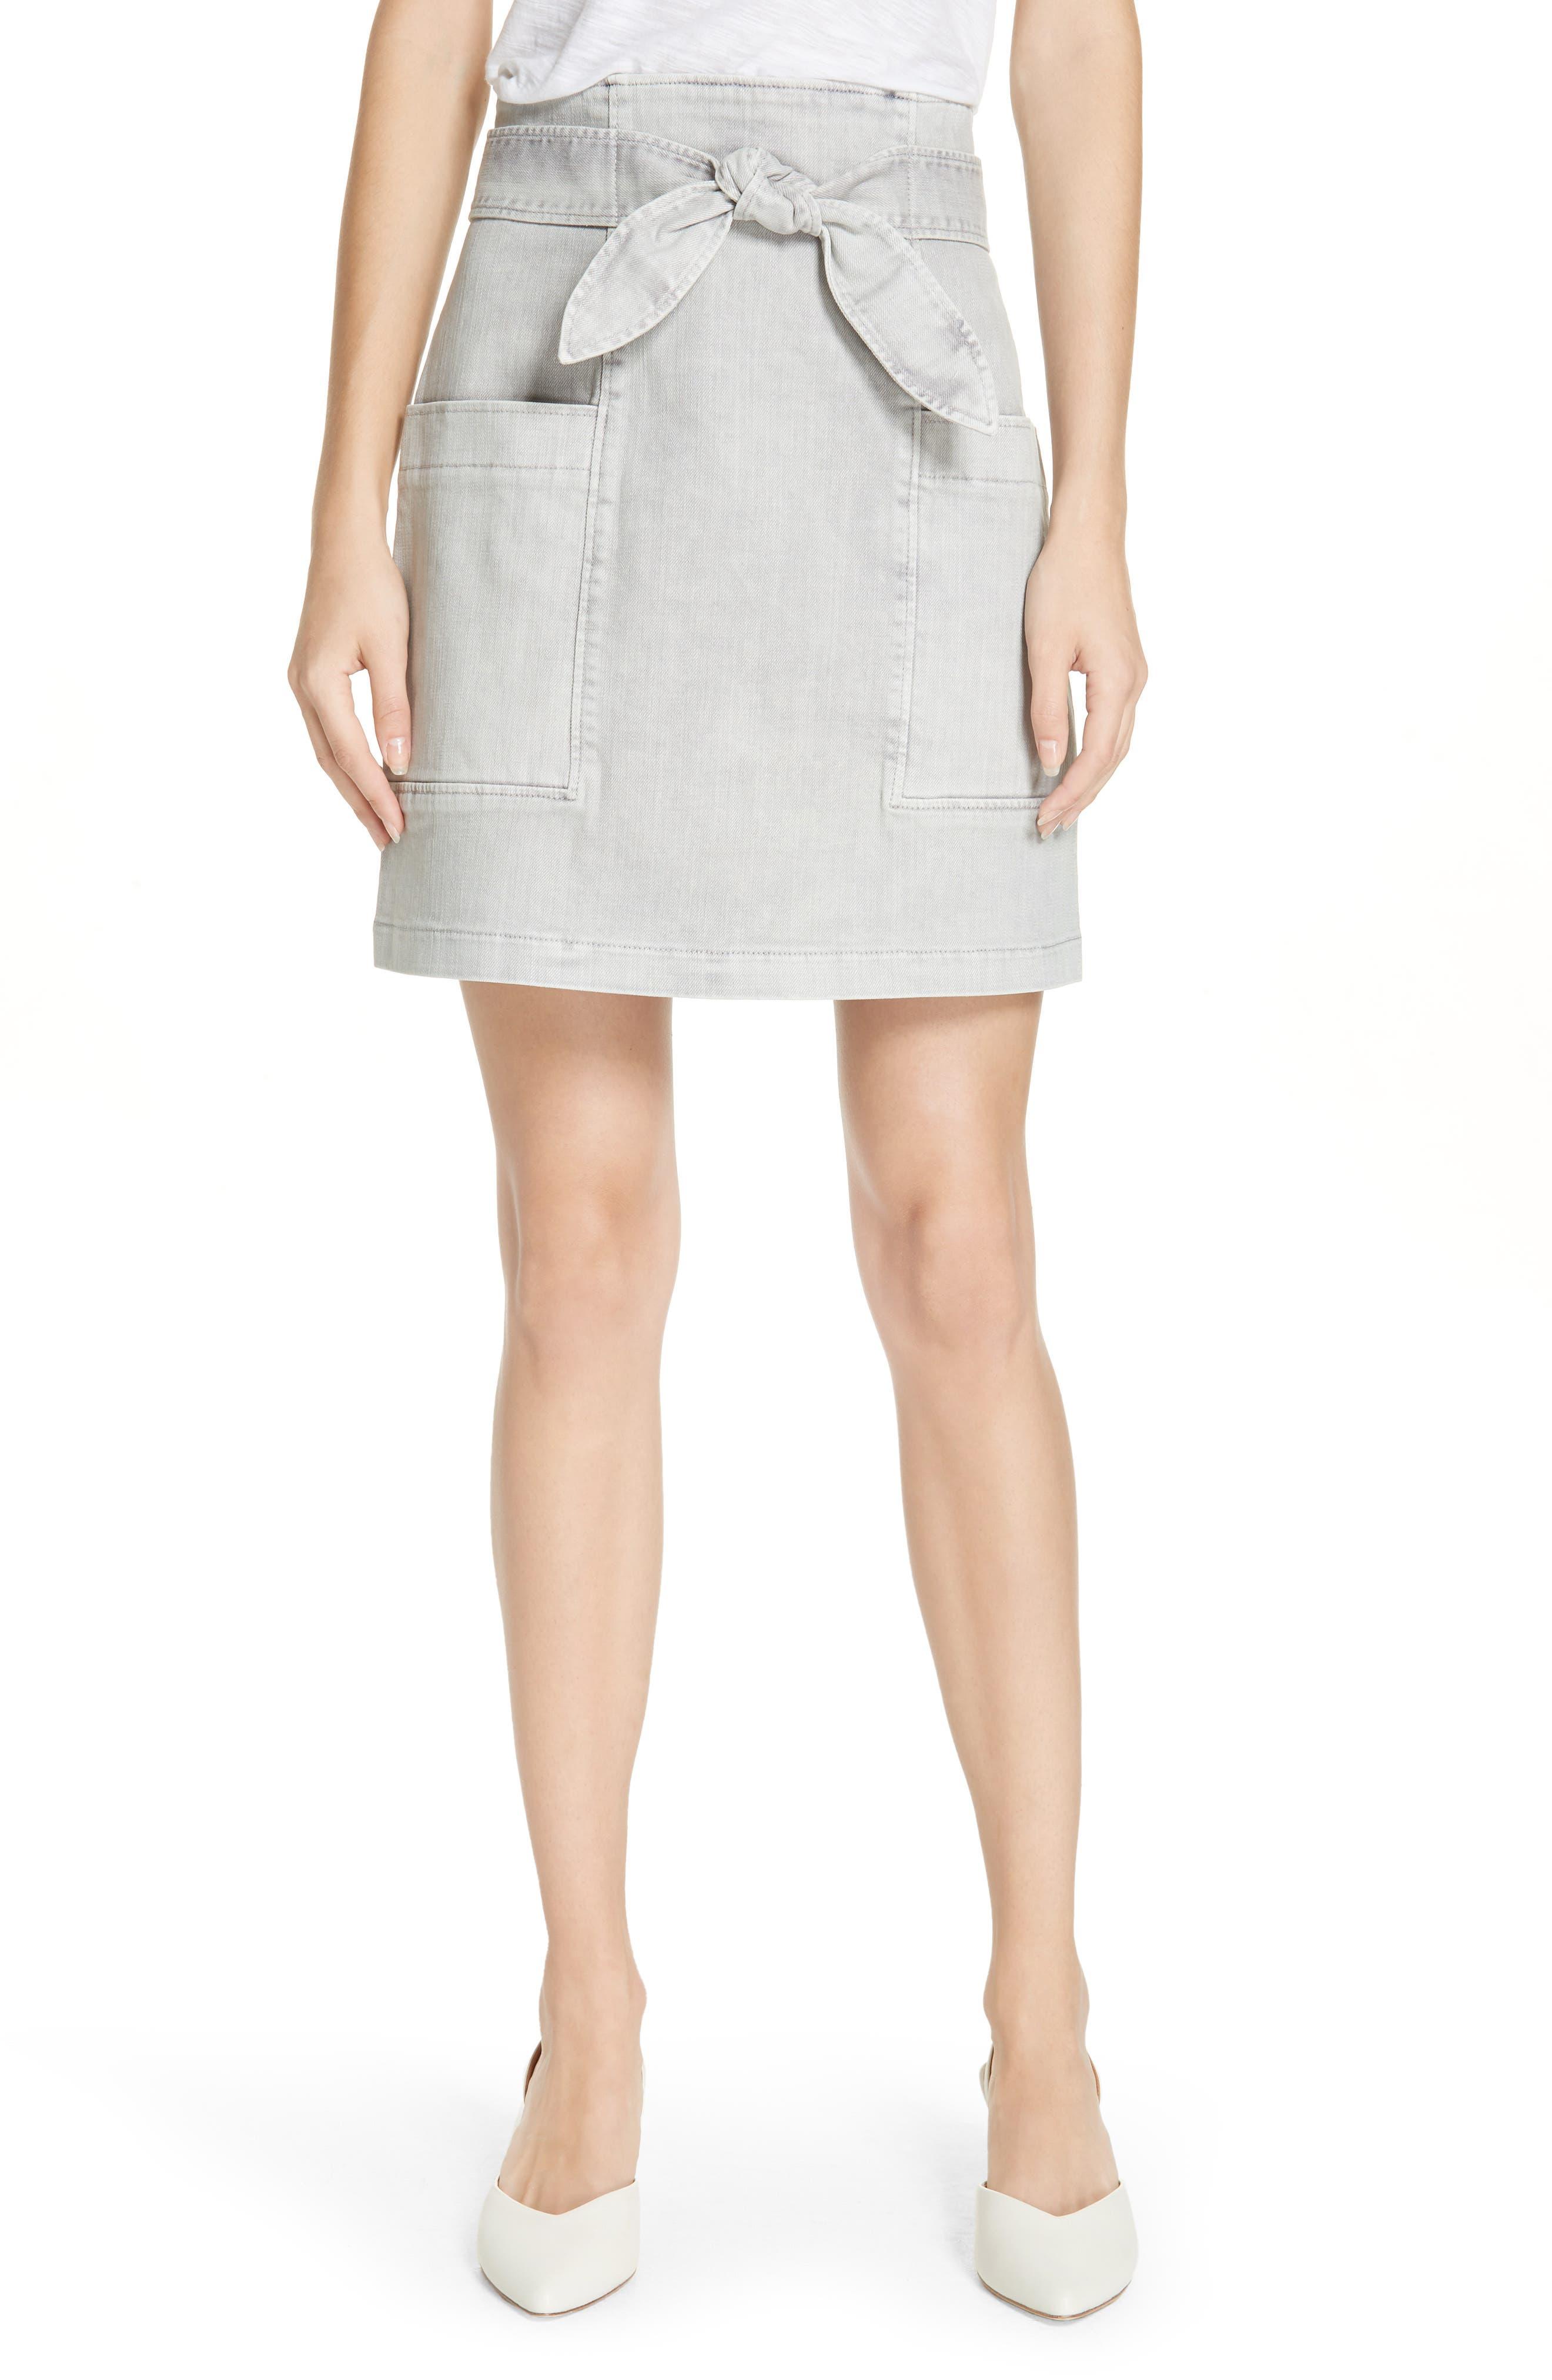 La Vie Rebecca Taylor Denim Skirt, Grey